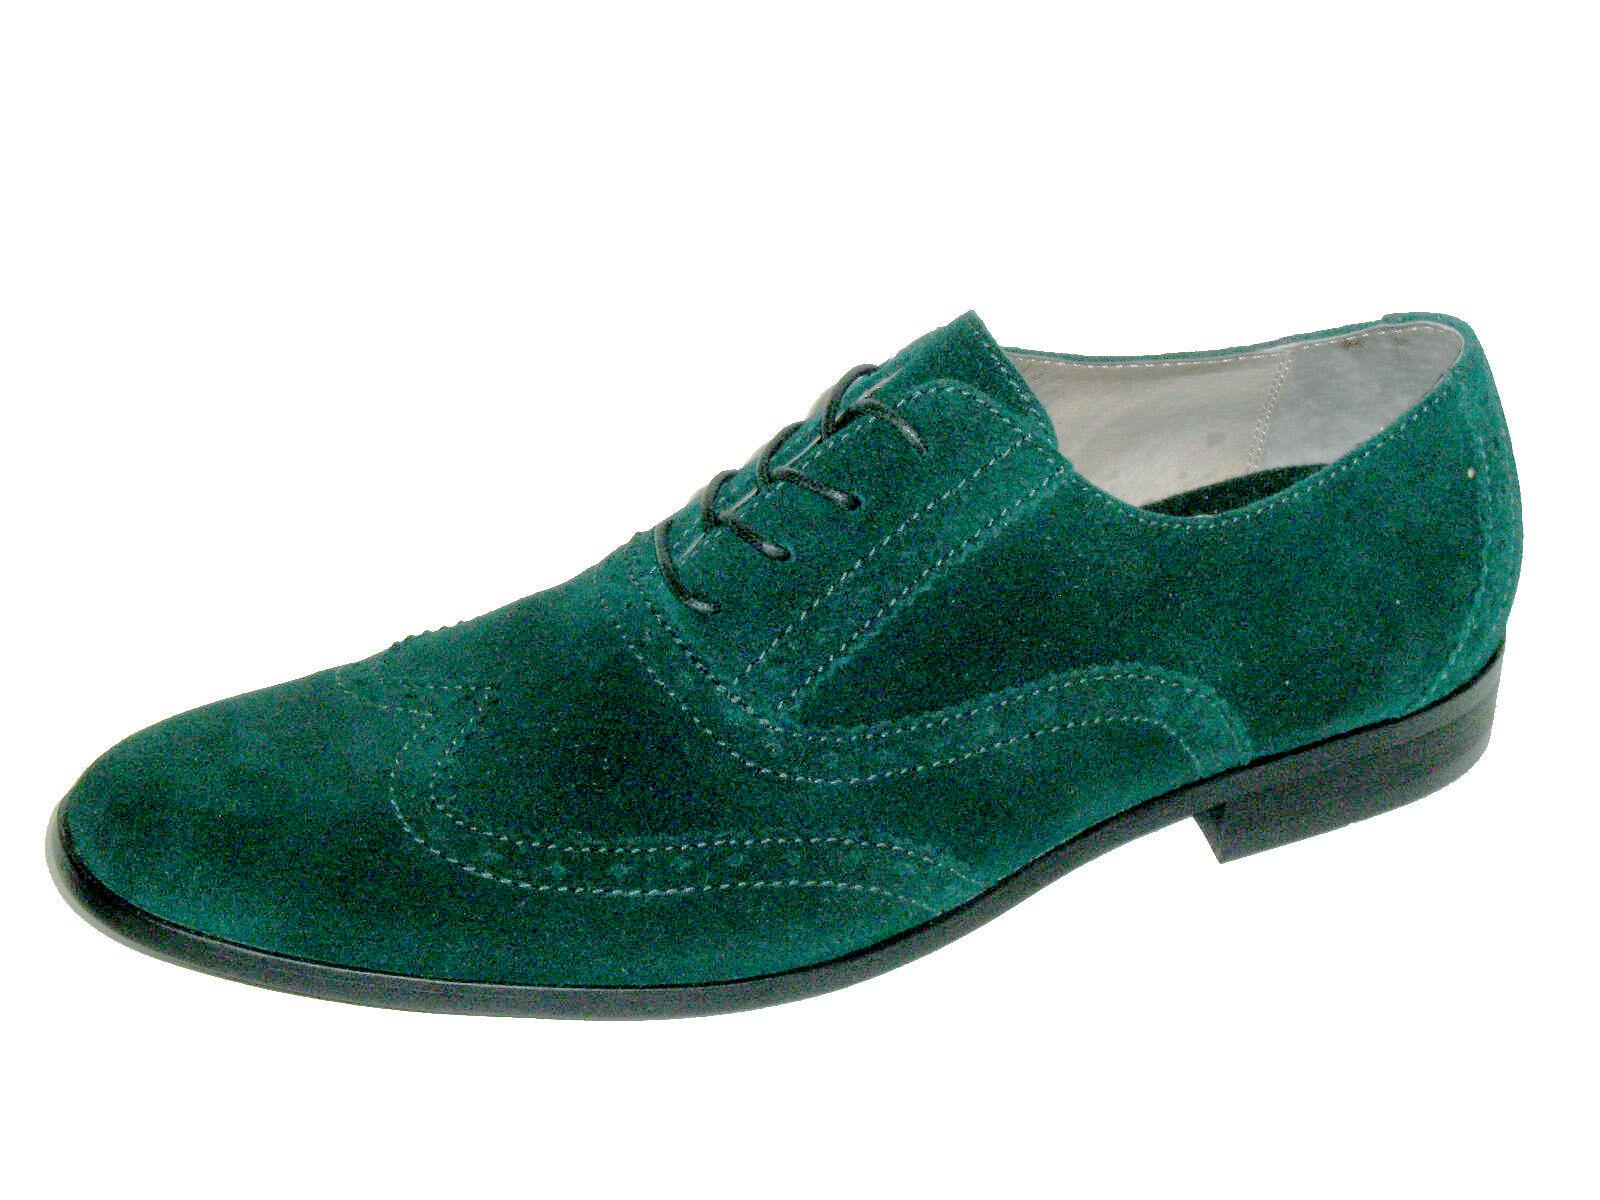 Original Penguin Men's shoes Wing Suede Pondepink Pine Wingtip Oxford Size 9 New